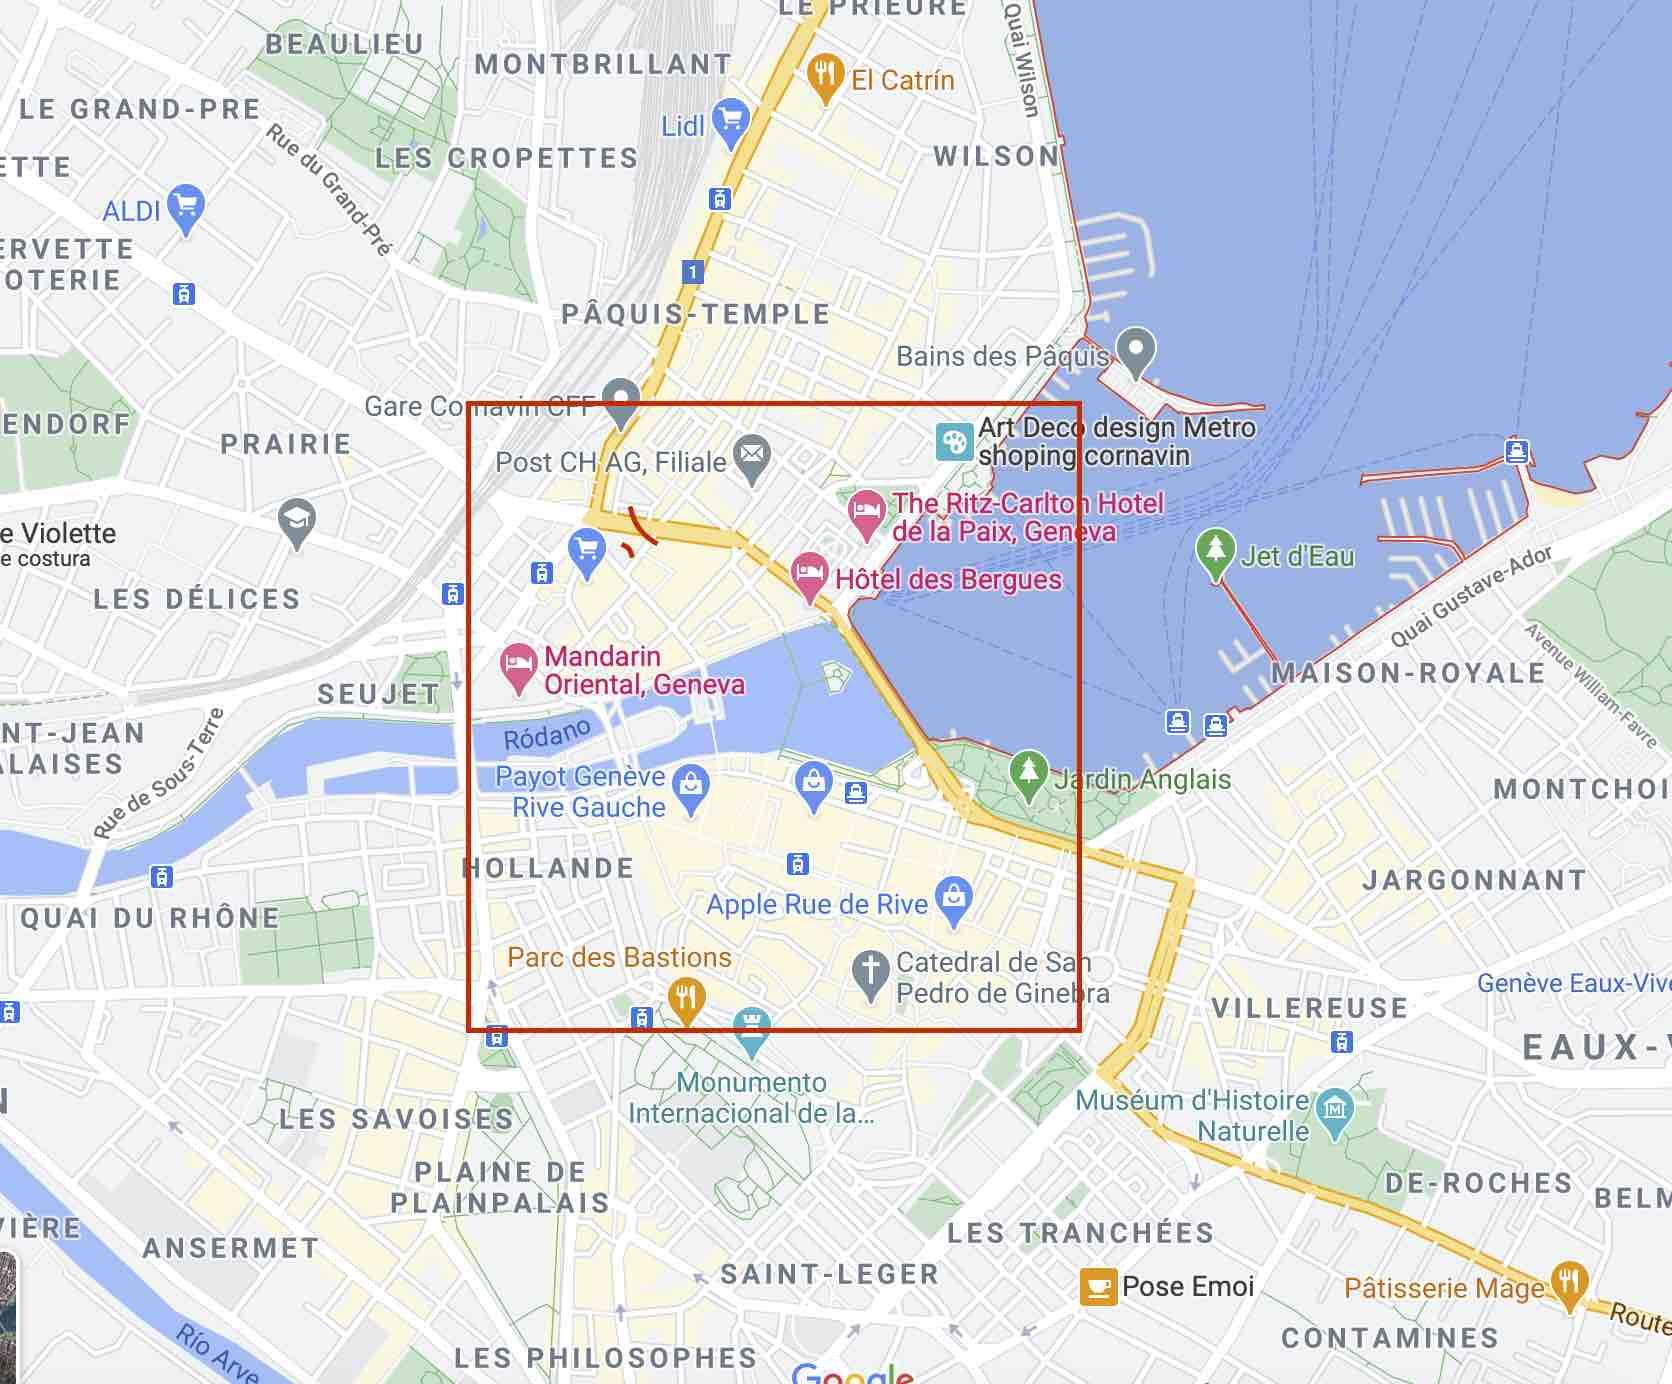 Mapa de Ginebra con la zona centro marcada en rojo